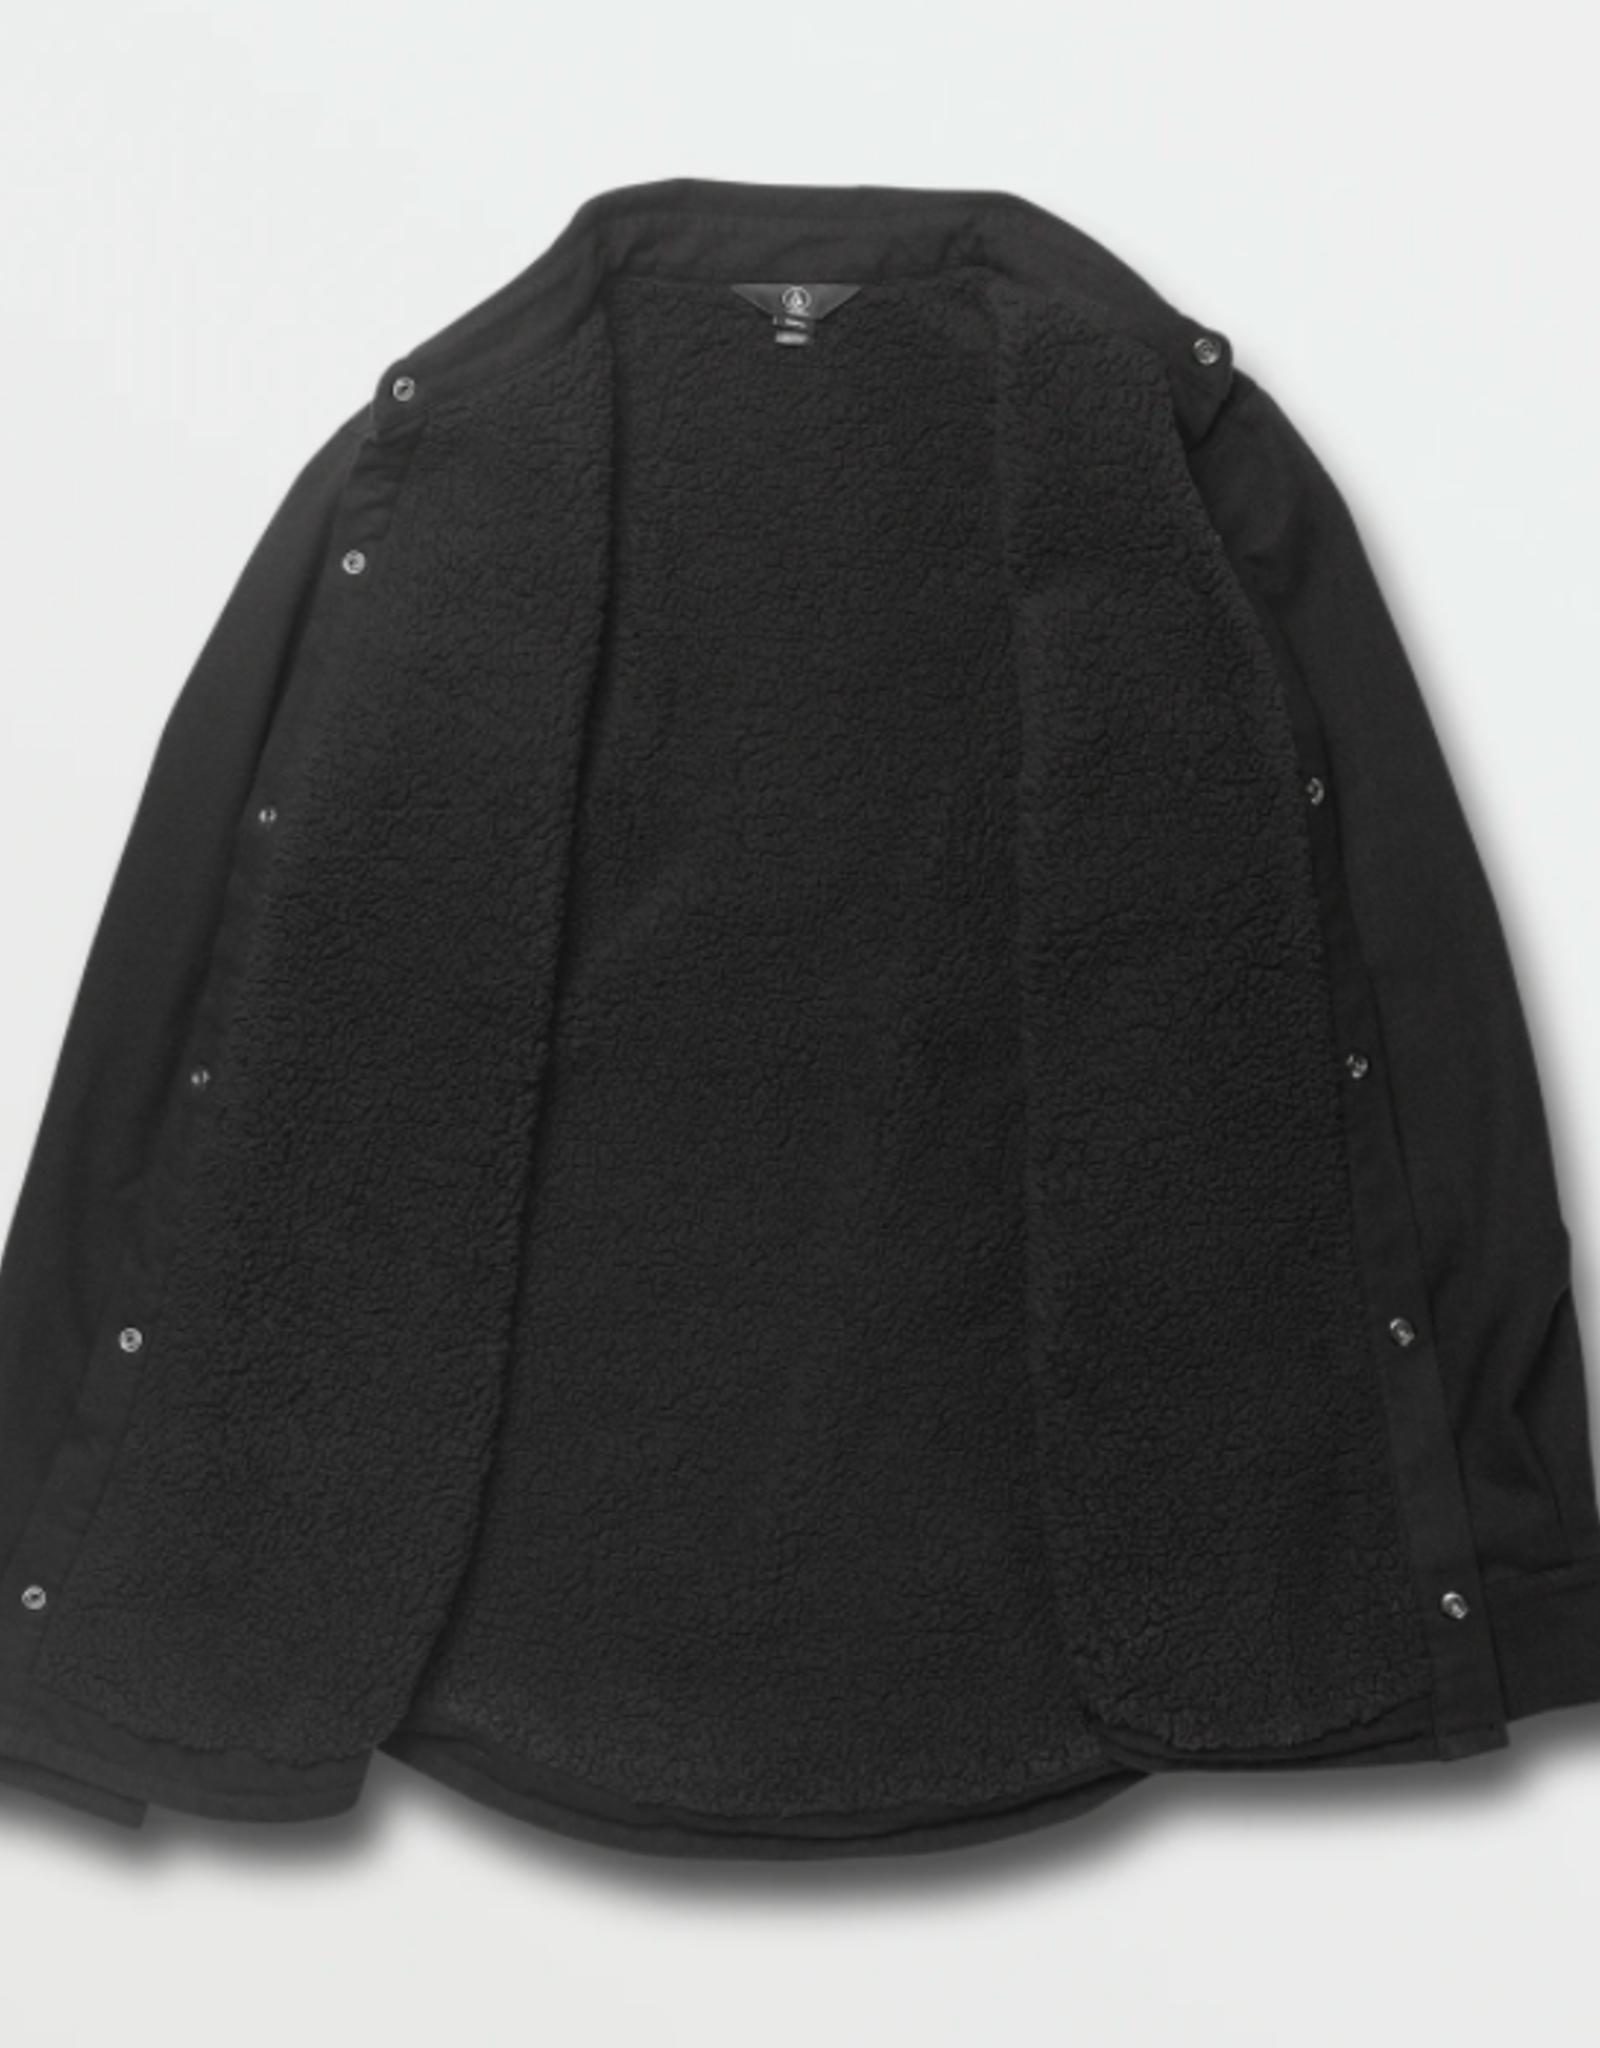 Volcom Men's Sherpa Flannel Jacket BKB